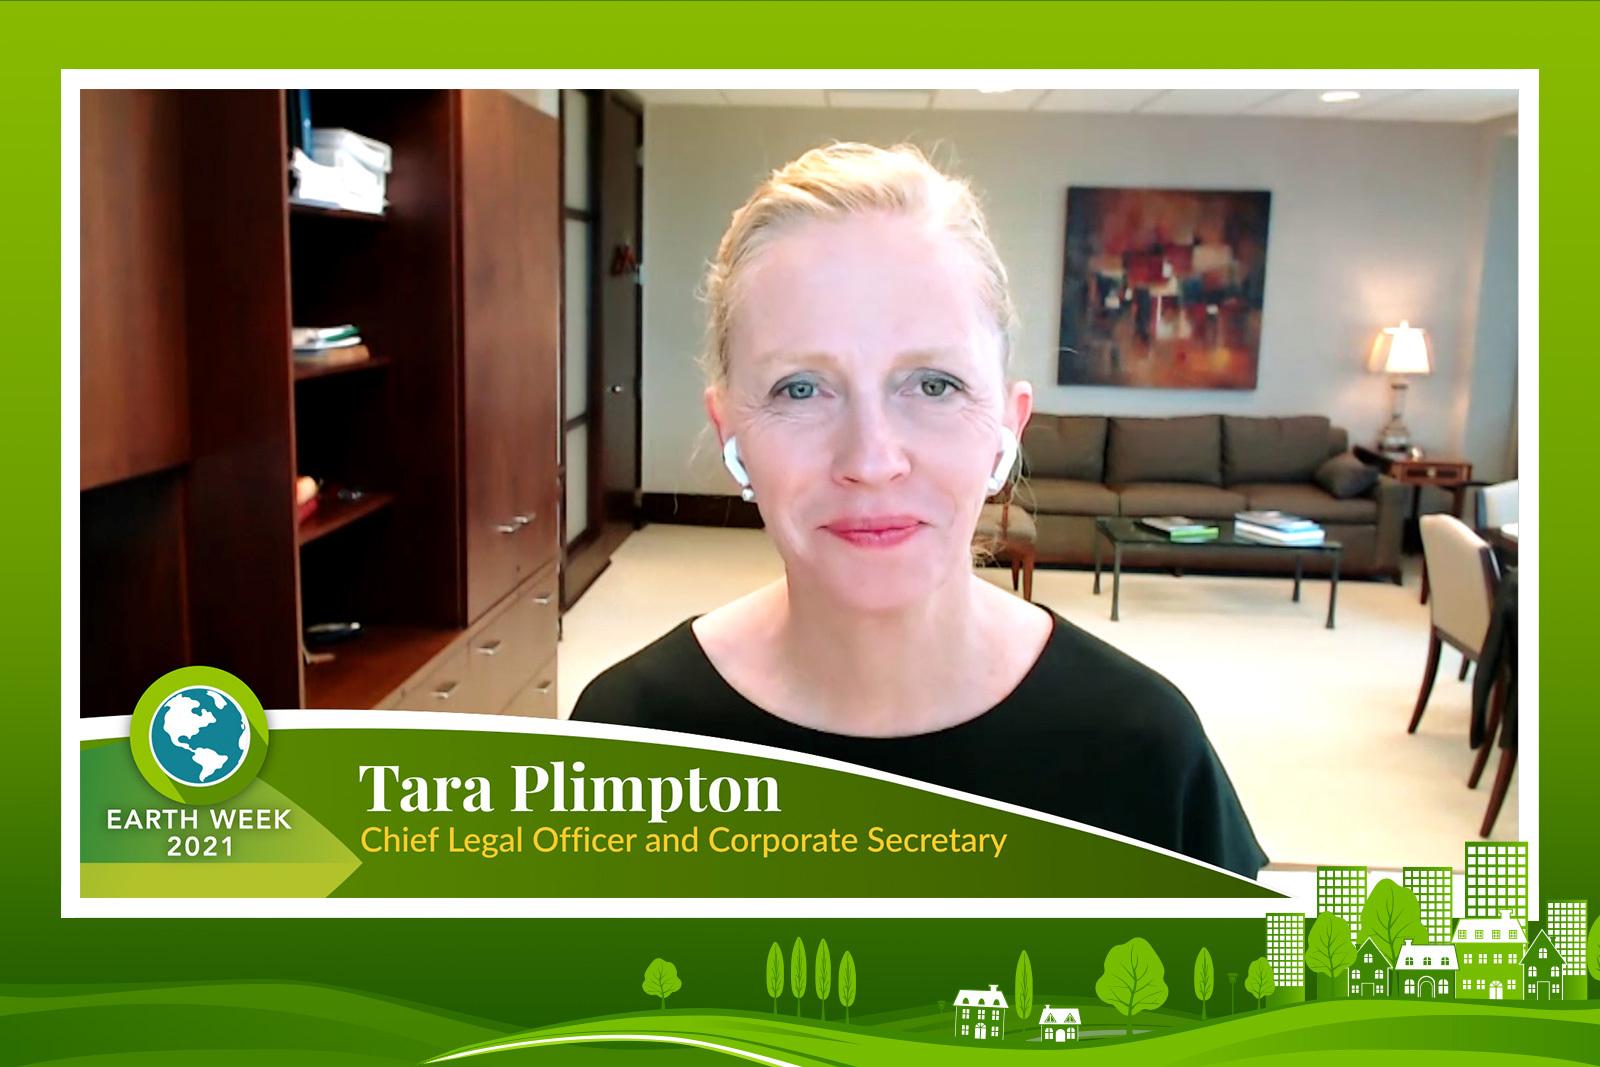 Tara Plimpton - Earth Week 2021